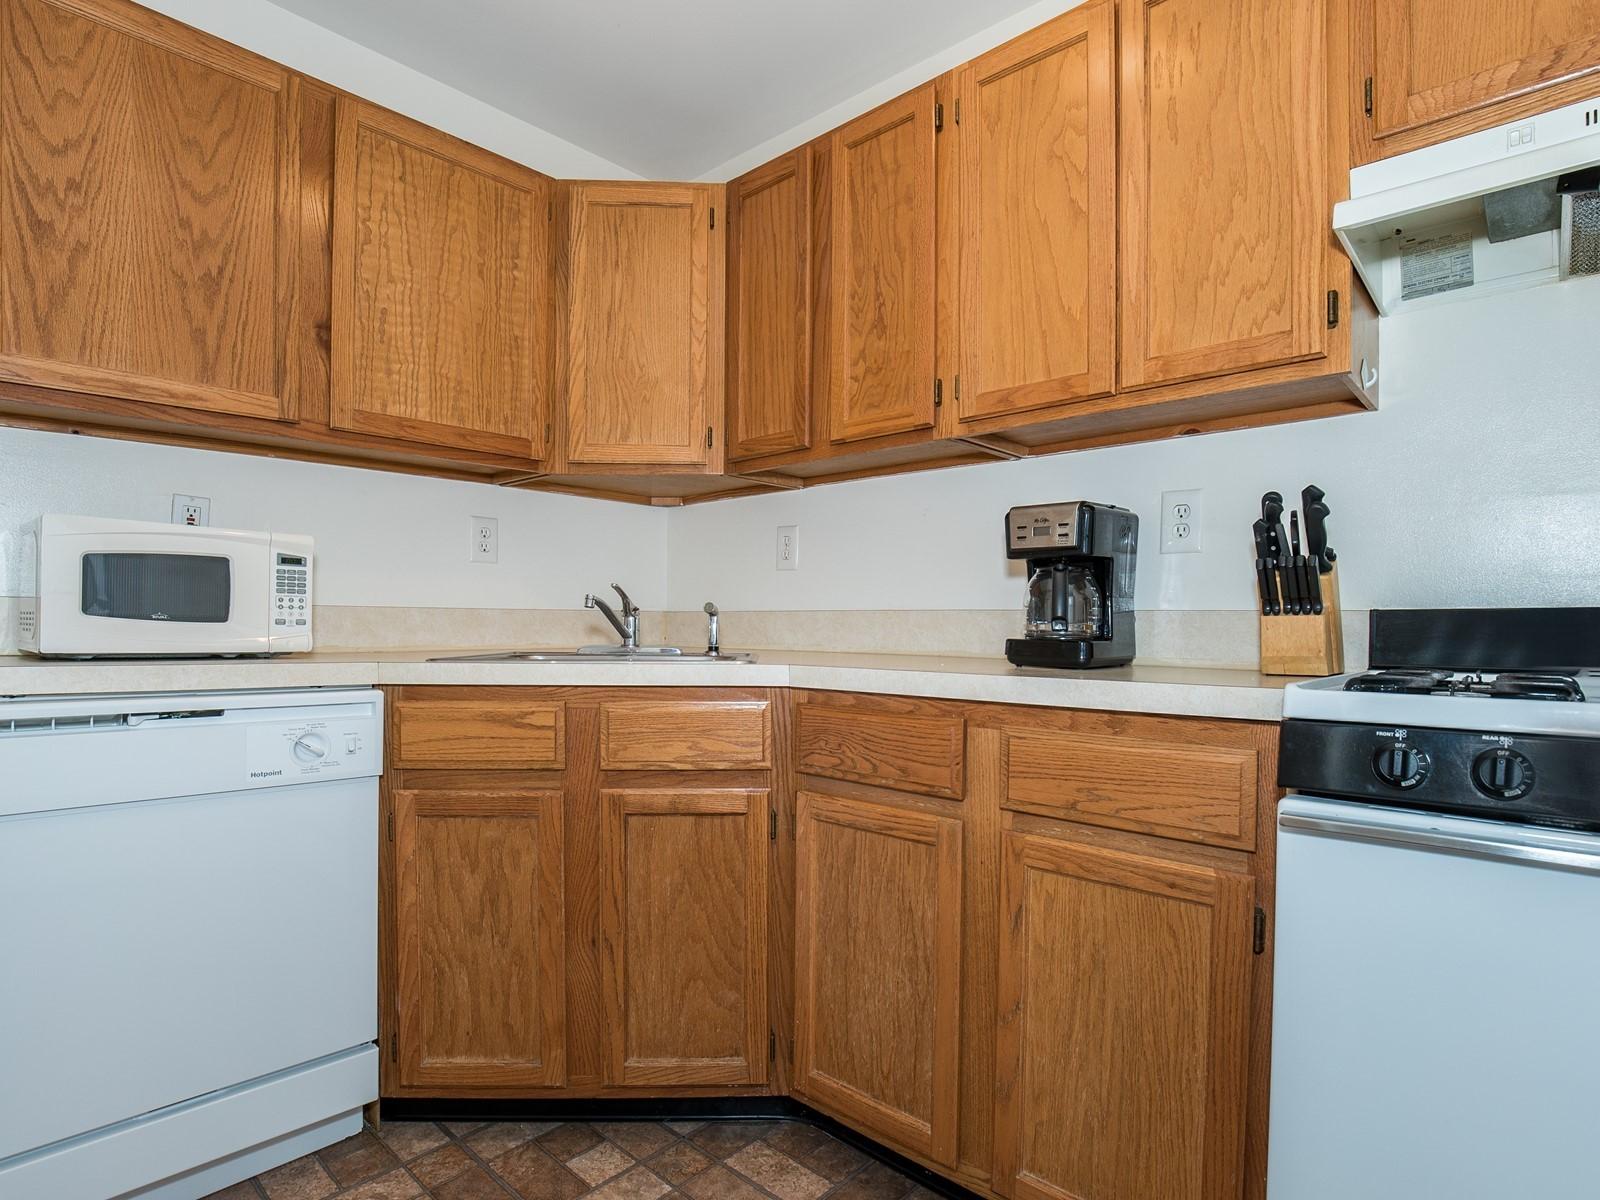 05_TemporaryHousing-South-Plainfield-721_Kitchen1